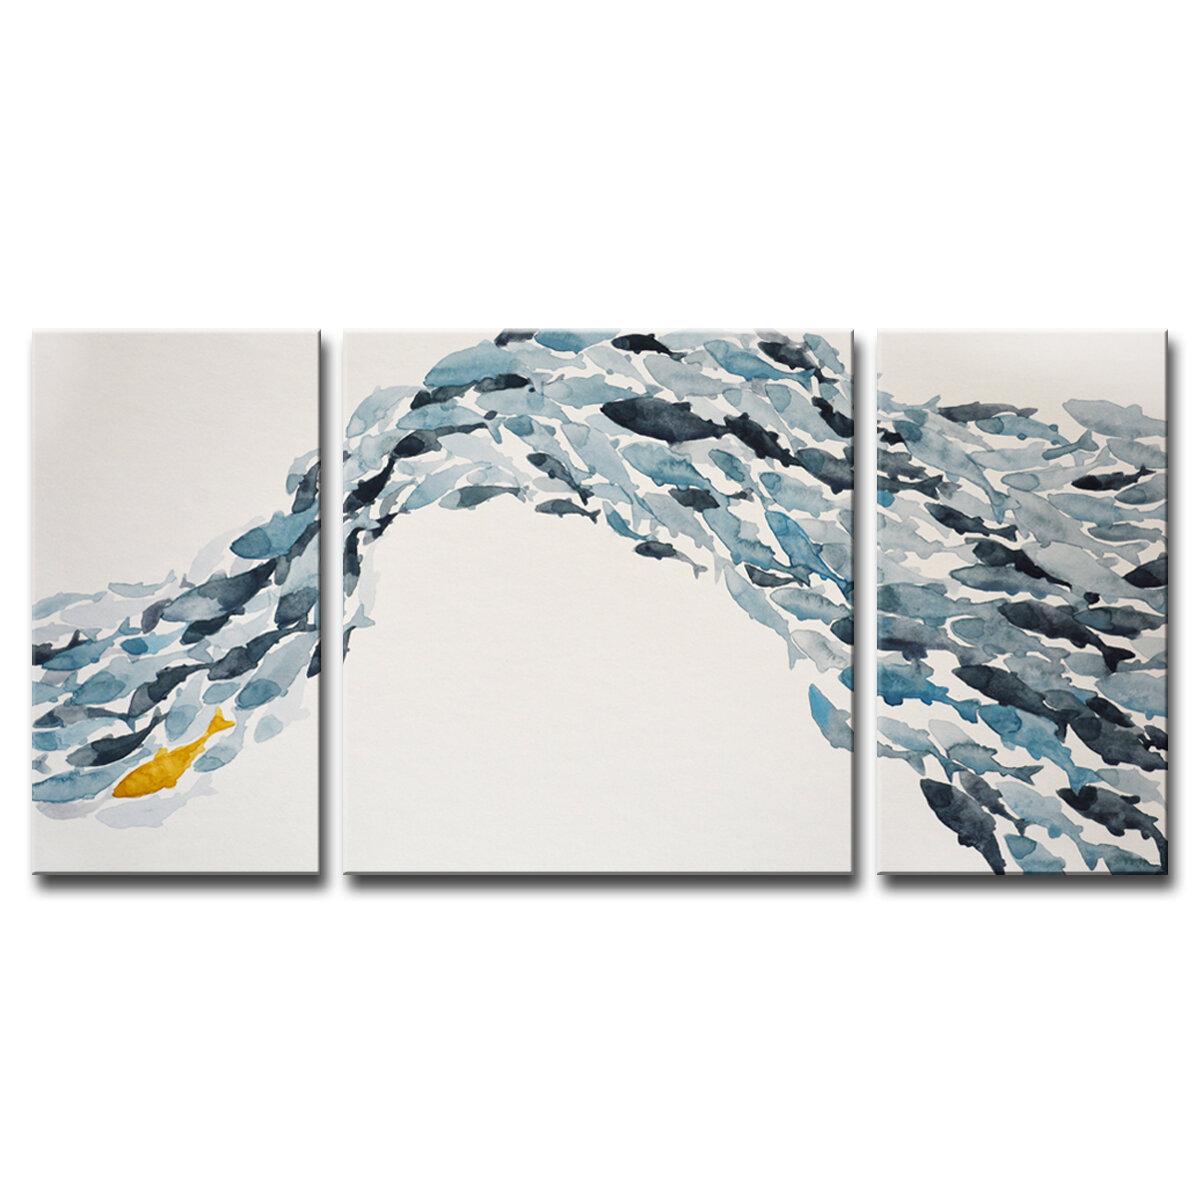 3 Piece Wall Art Free Shipping Over 35 Wayfair